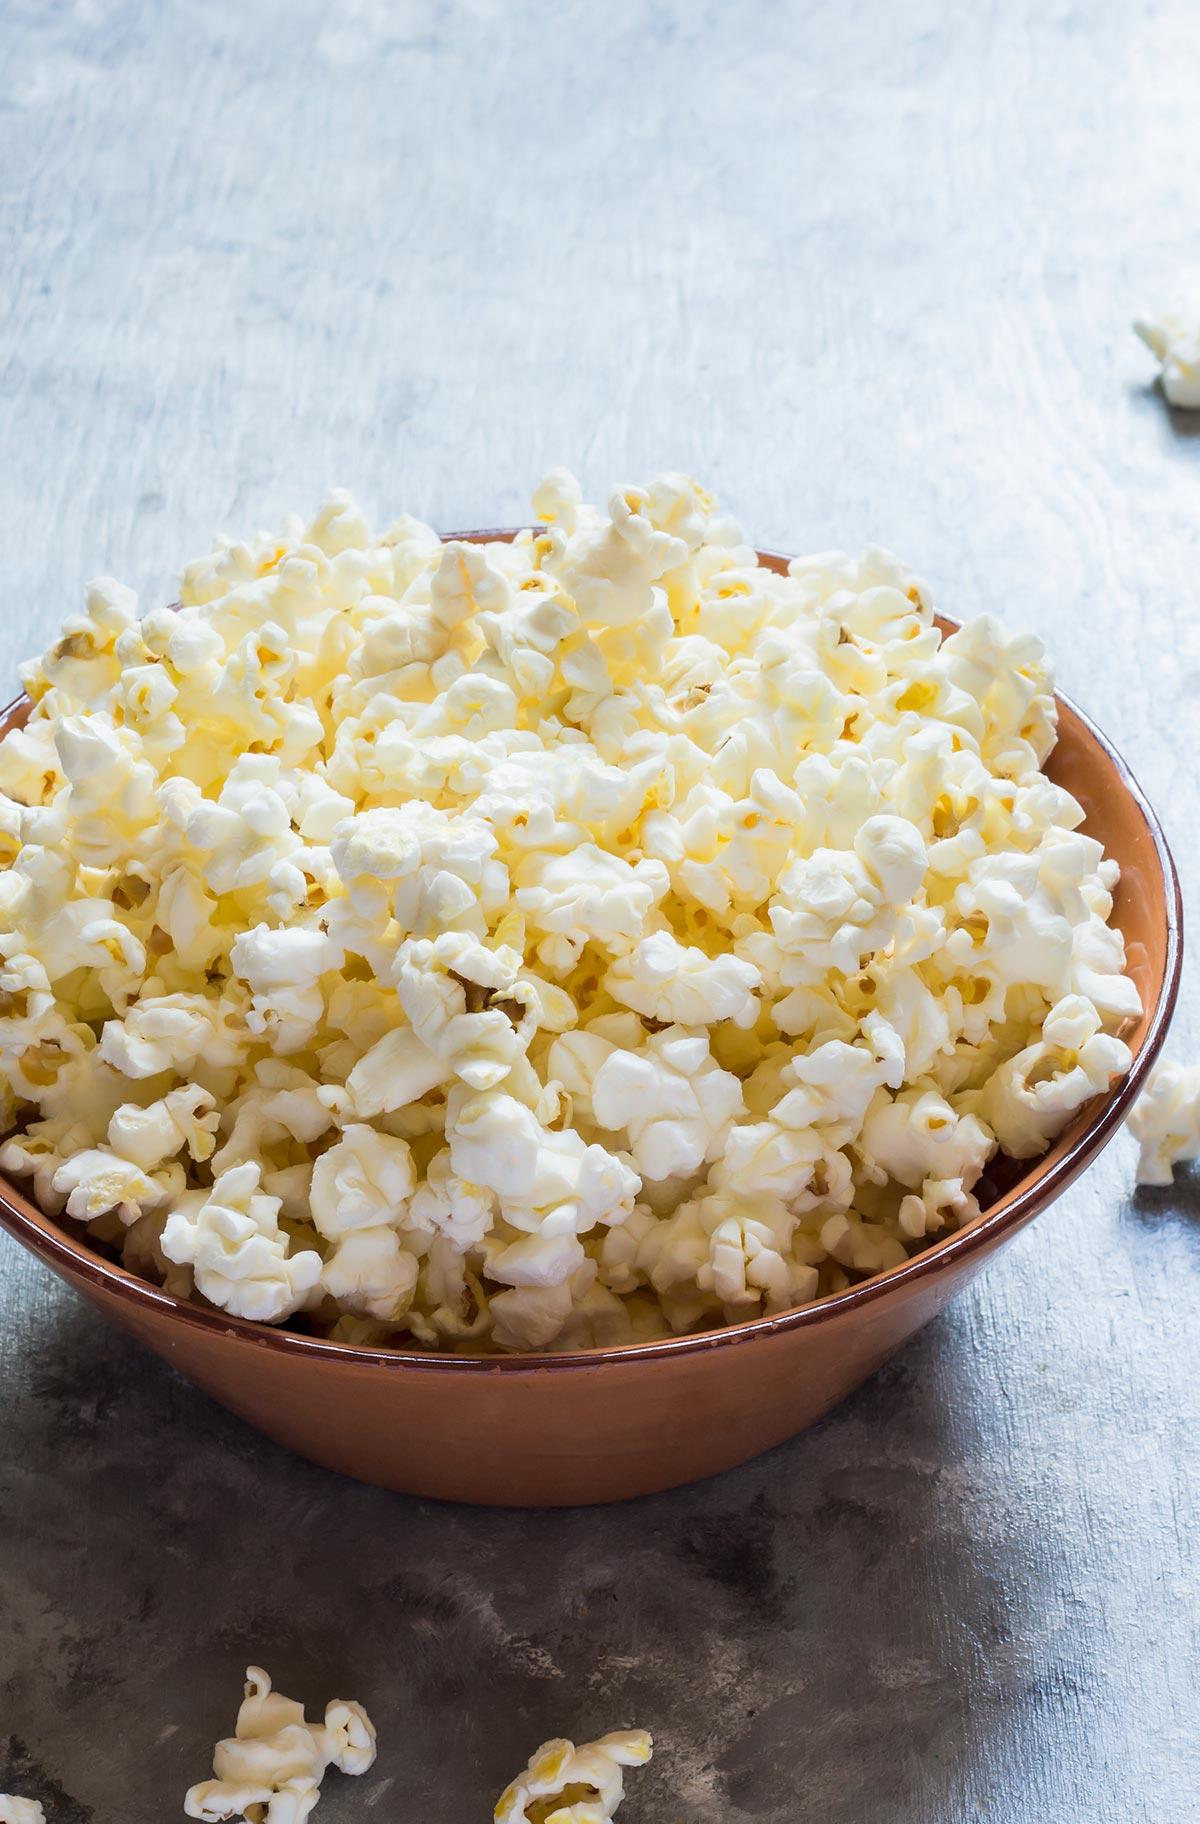 Bowl of Popcorn